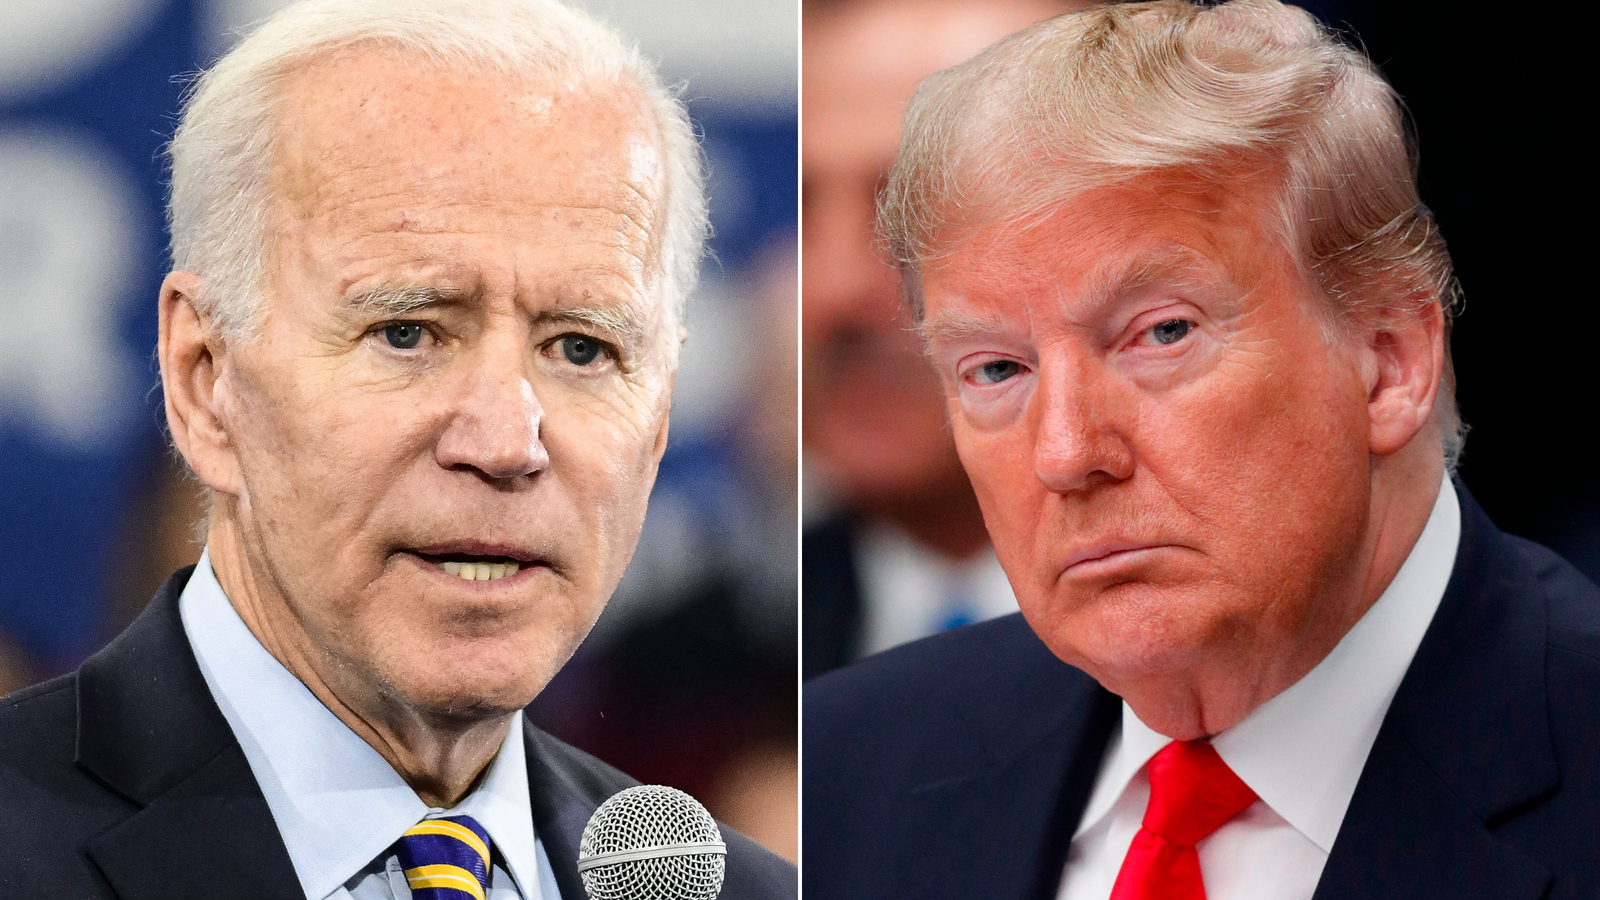 Biden campaign says he backs Trump's China travel ban